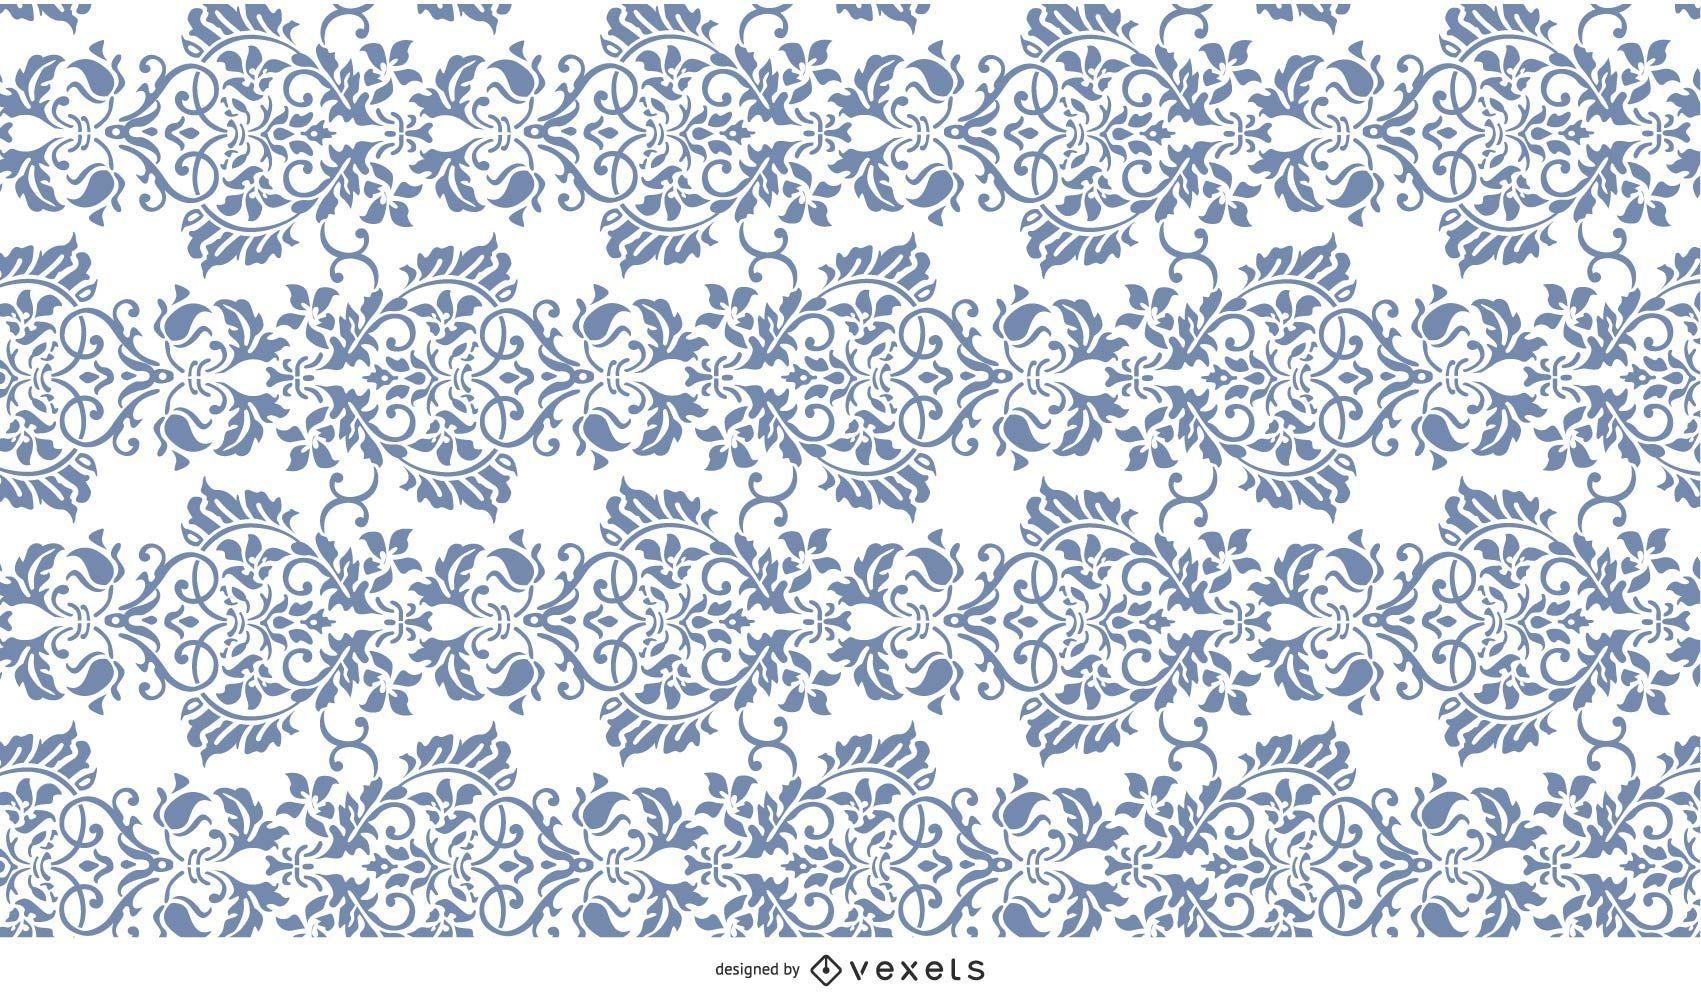 Ornate flower pattern